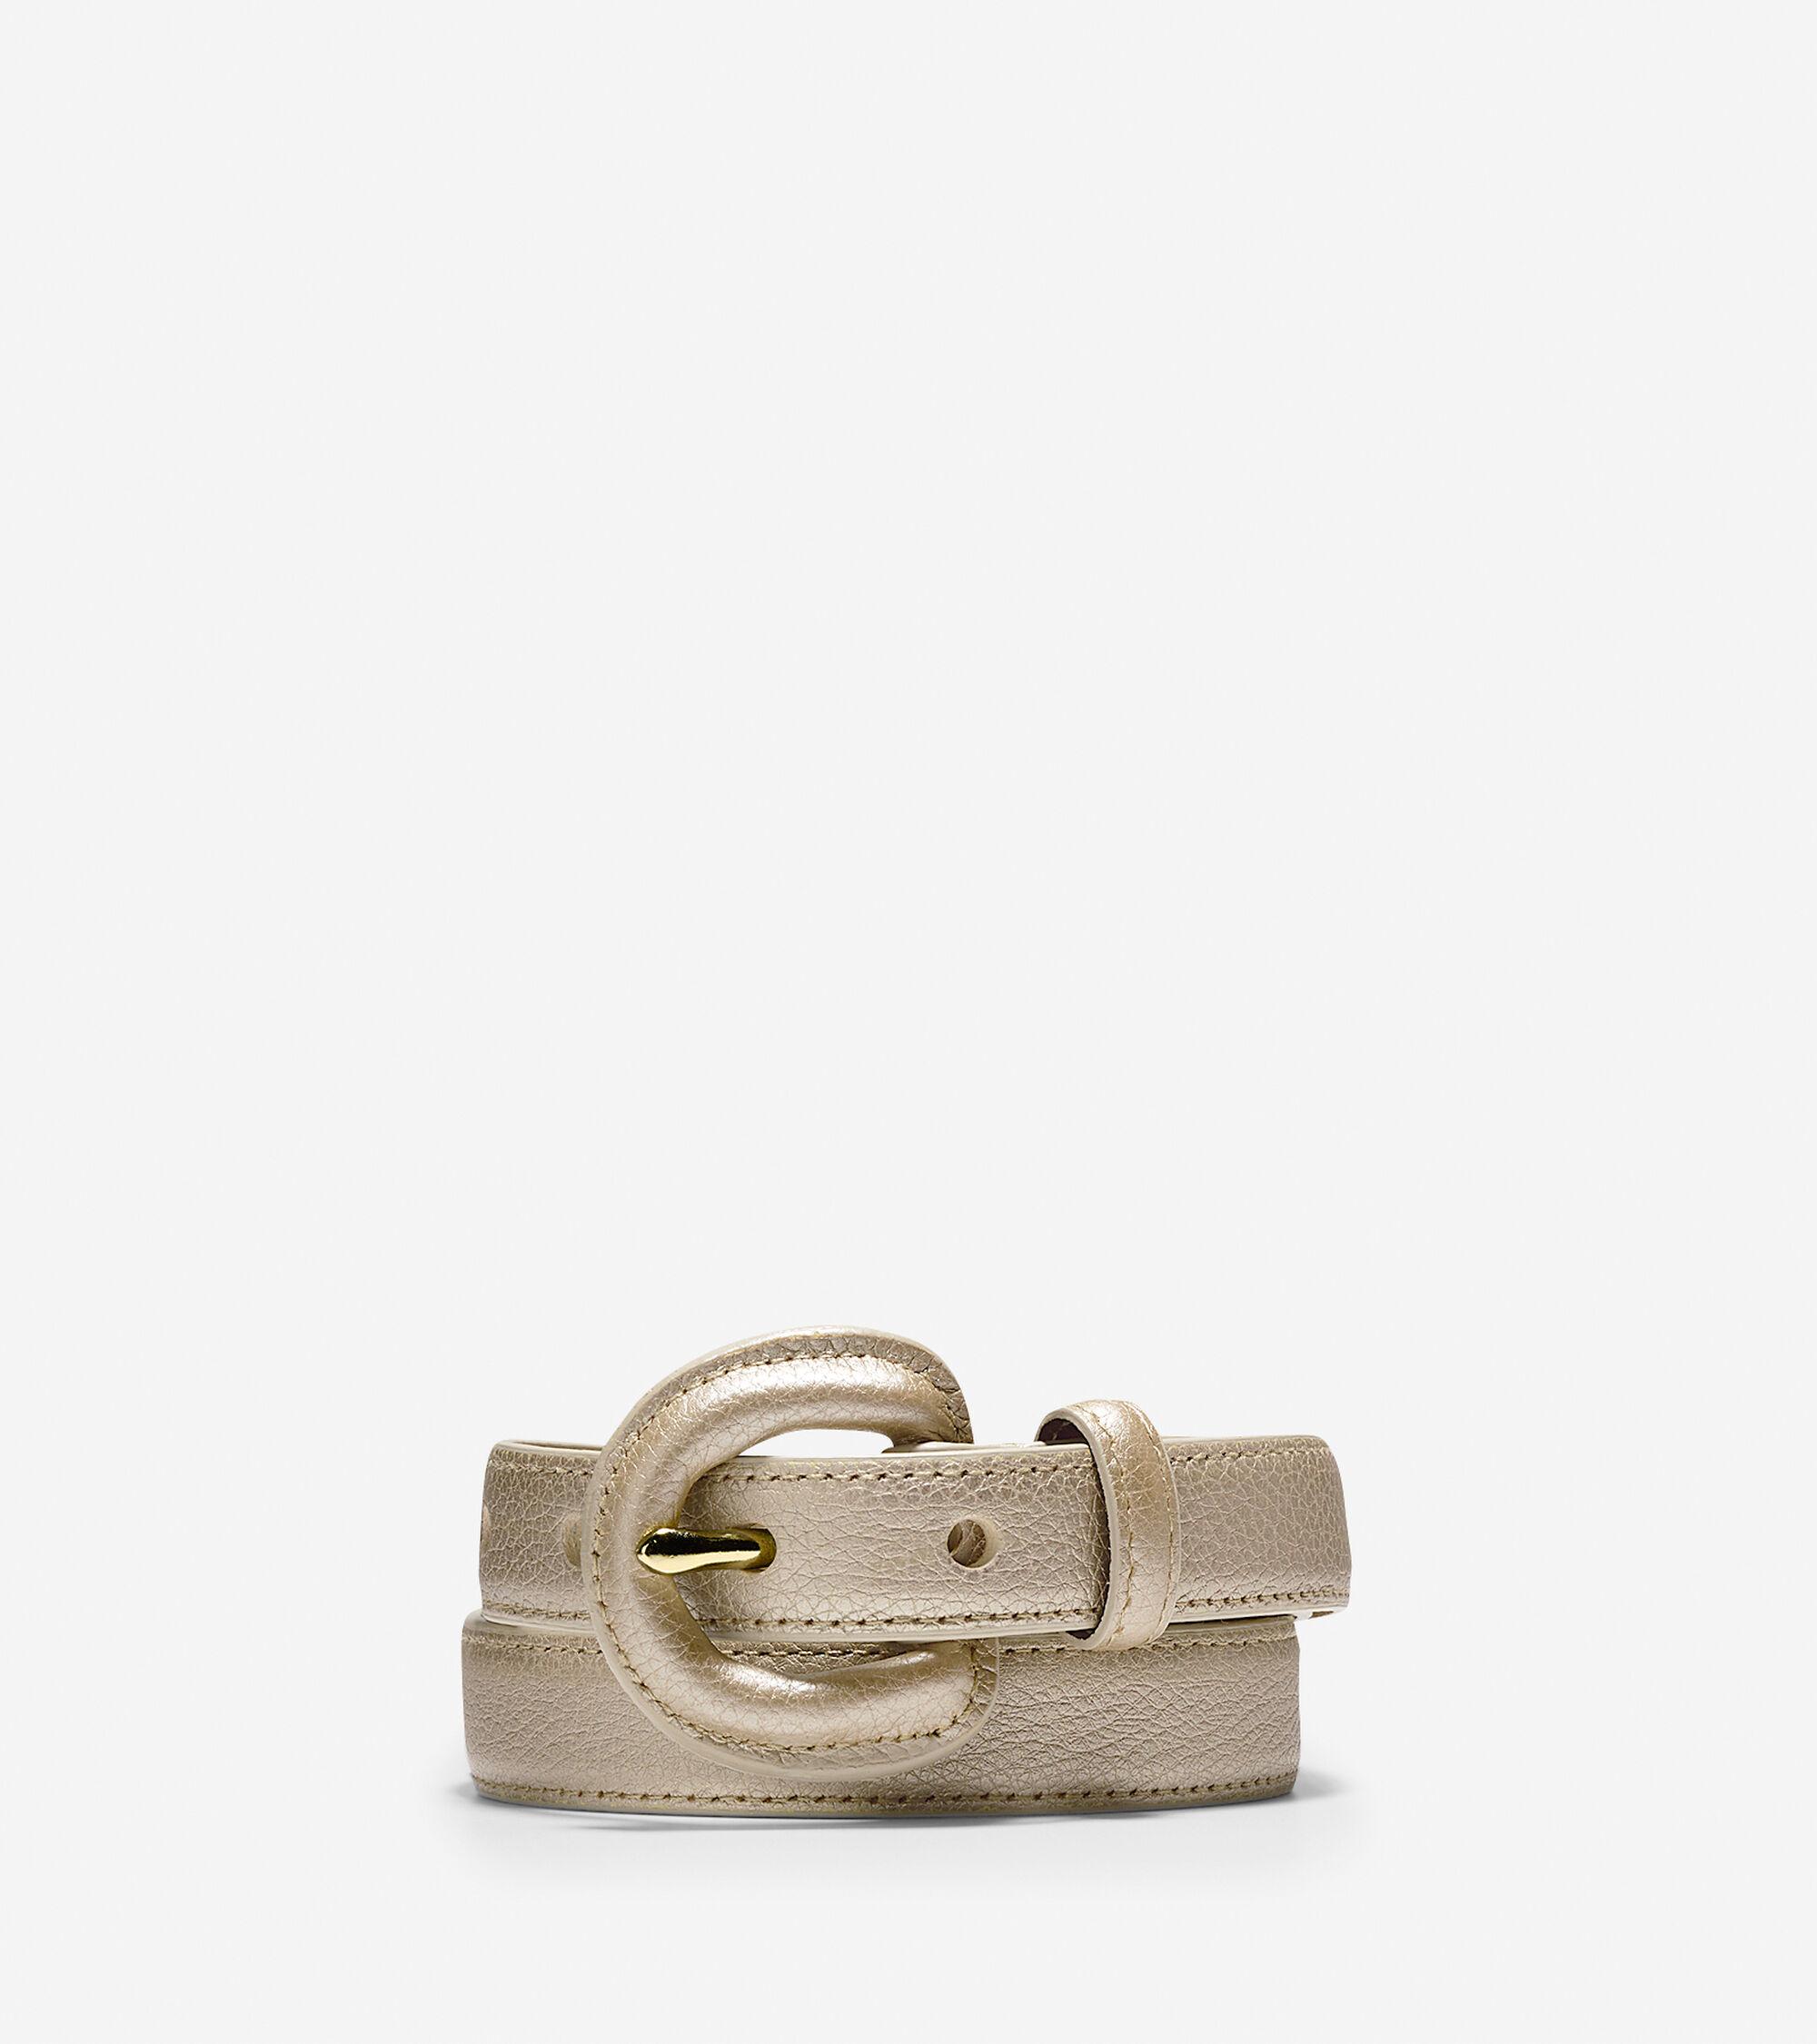 Accessories > Italian Calf Leather Belt